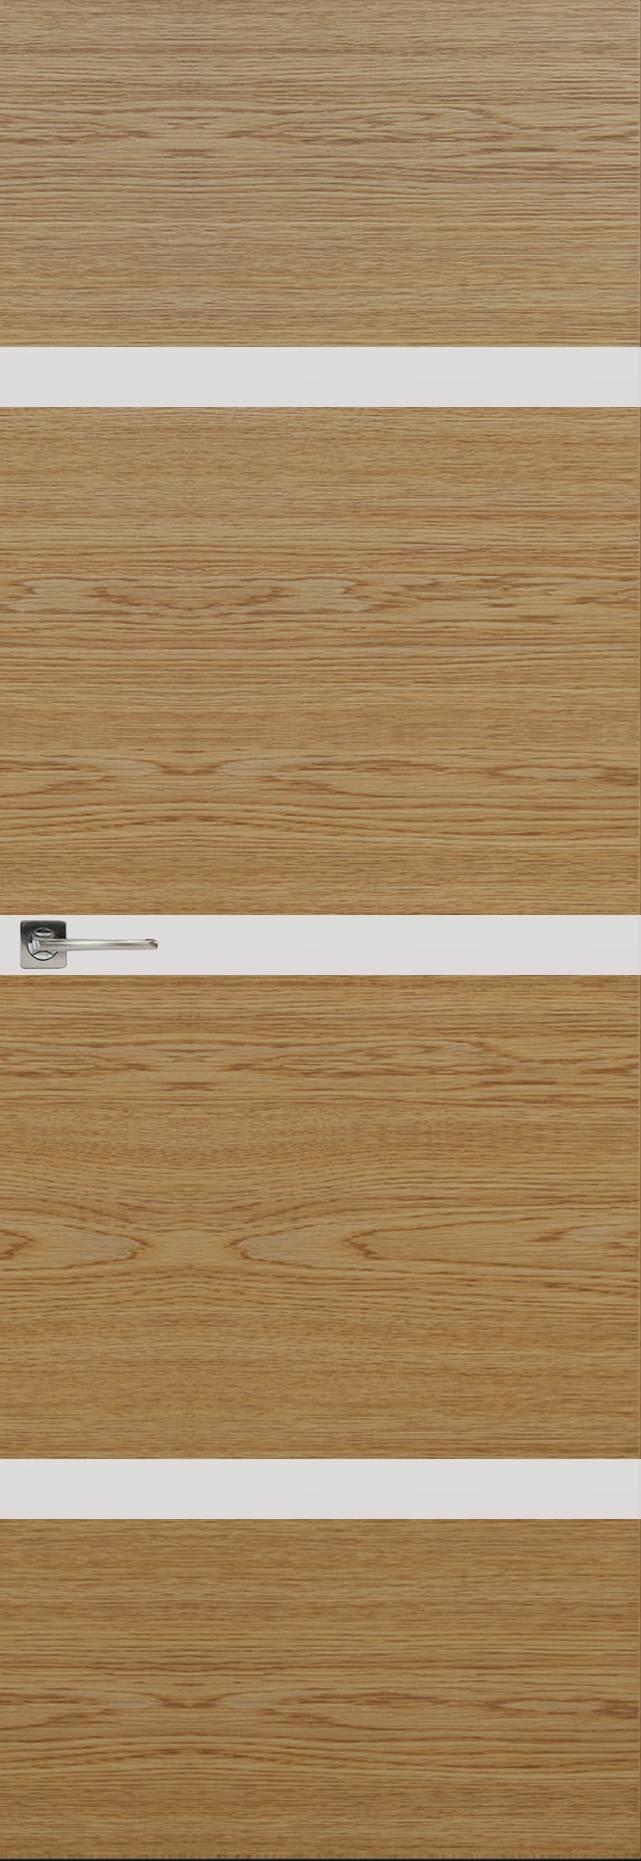 Tivoli Г-4 Невидимка цвет - Дуб карамель Без стекла (ДГ)